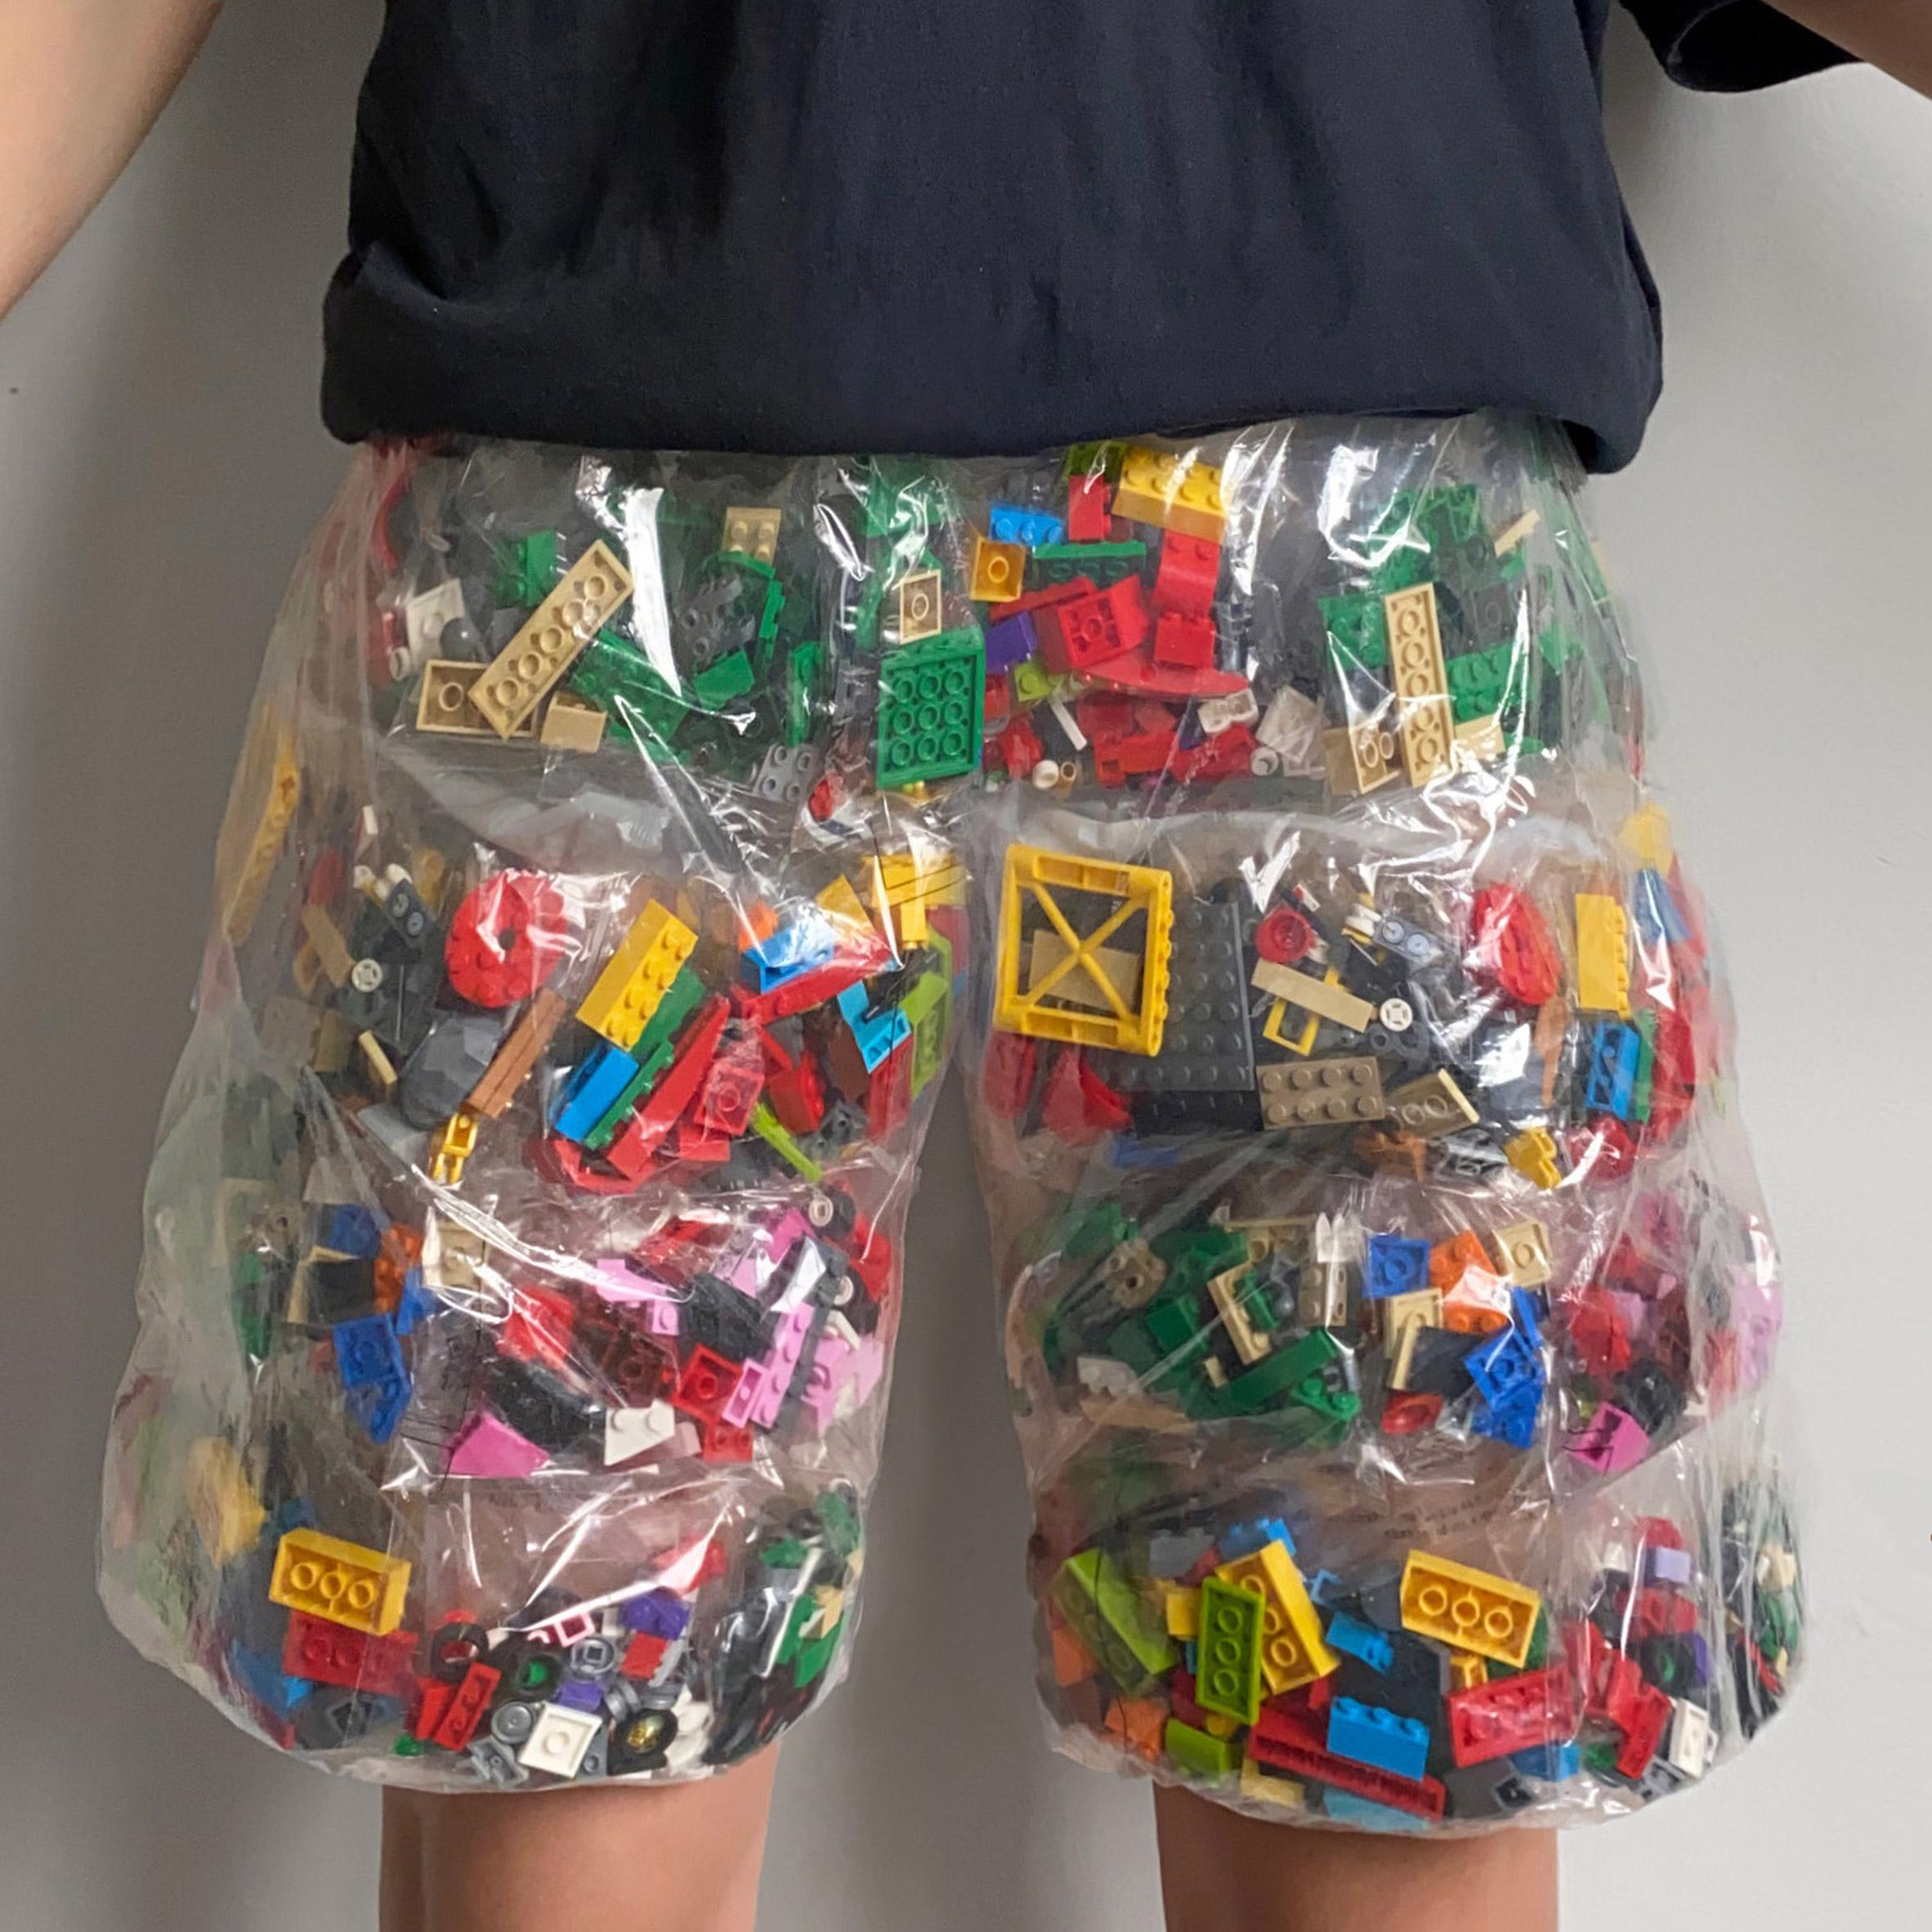 Lego Shorts by Nicole McLaughlin